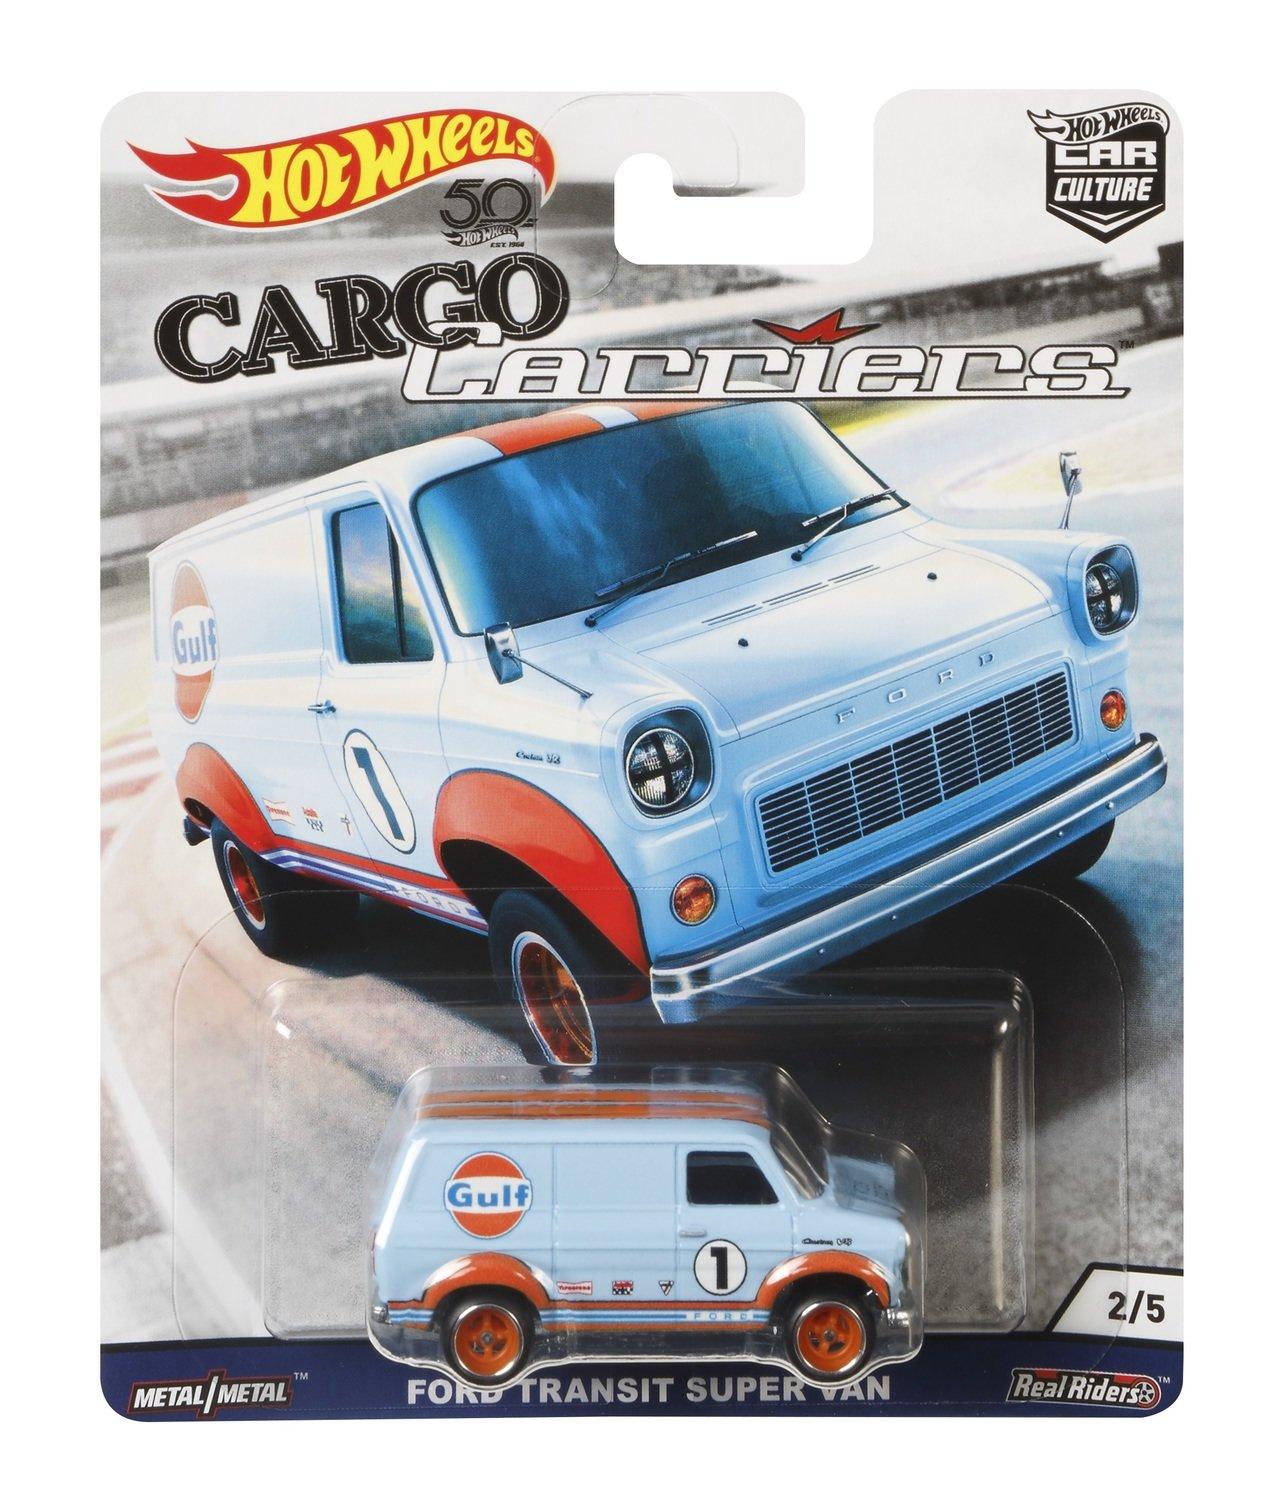 FORD TRANSIT SUPER VAN フォード・トランジット・スーパー・バン